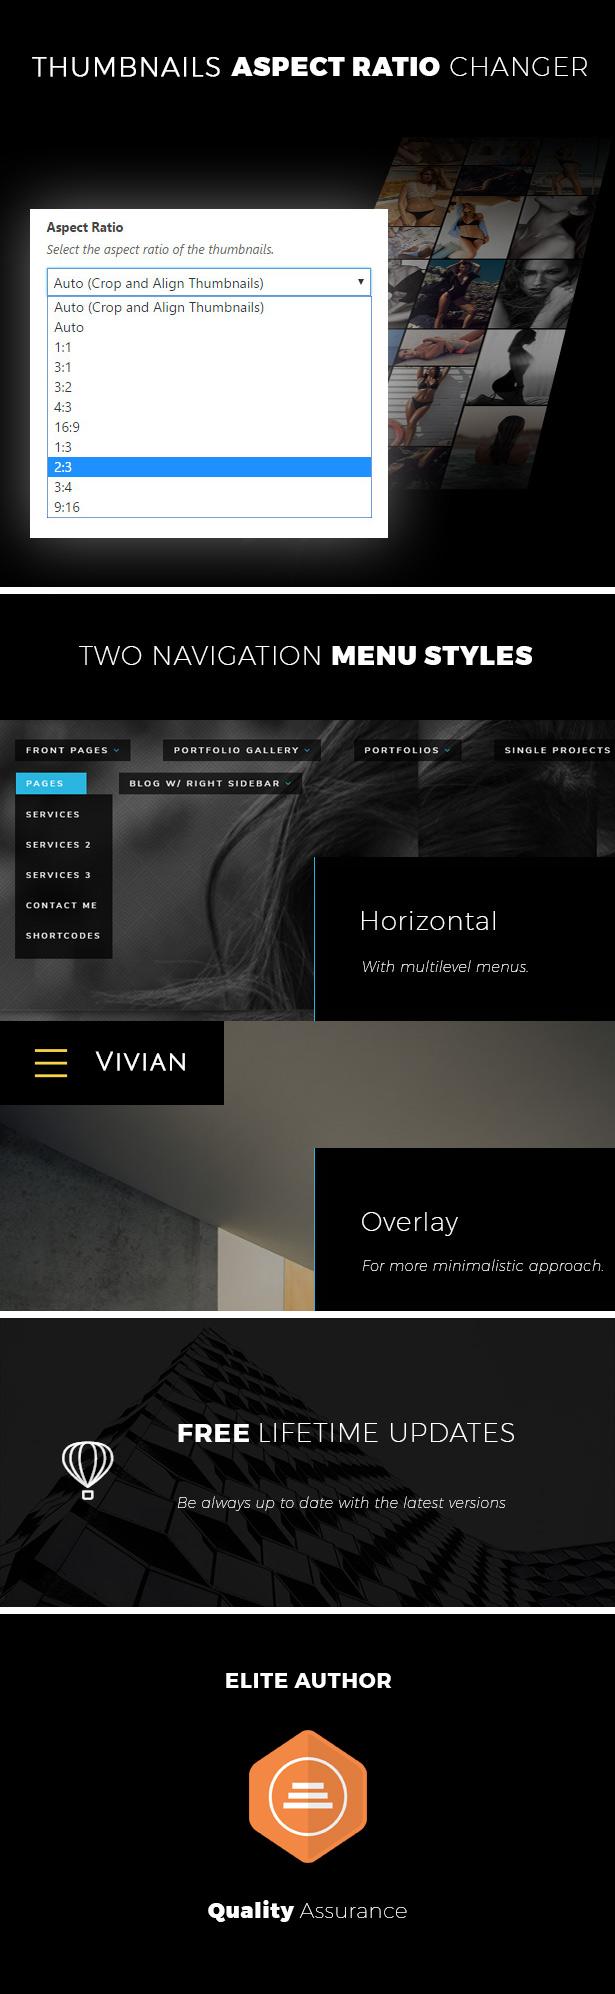 Vivian Description